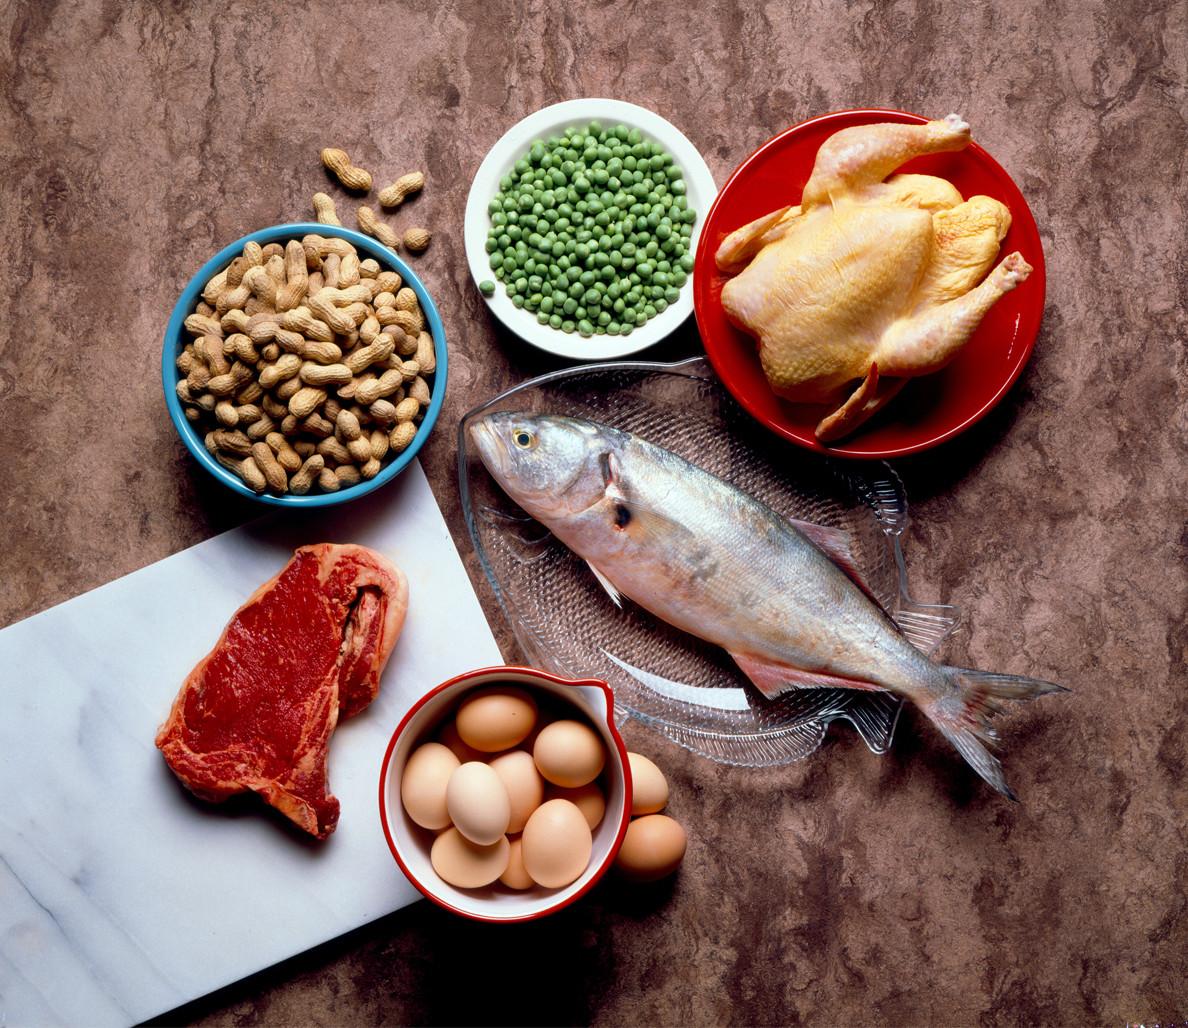 cach giam can cho nguoi de tang can - nap protein - elle man